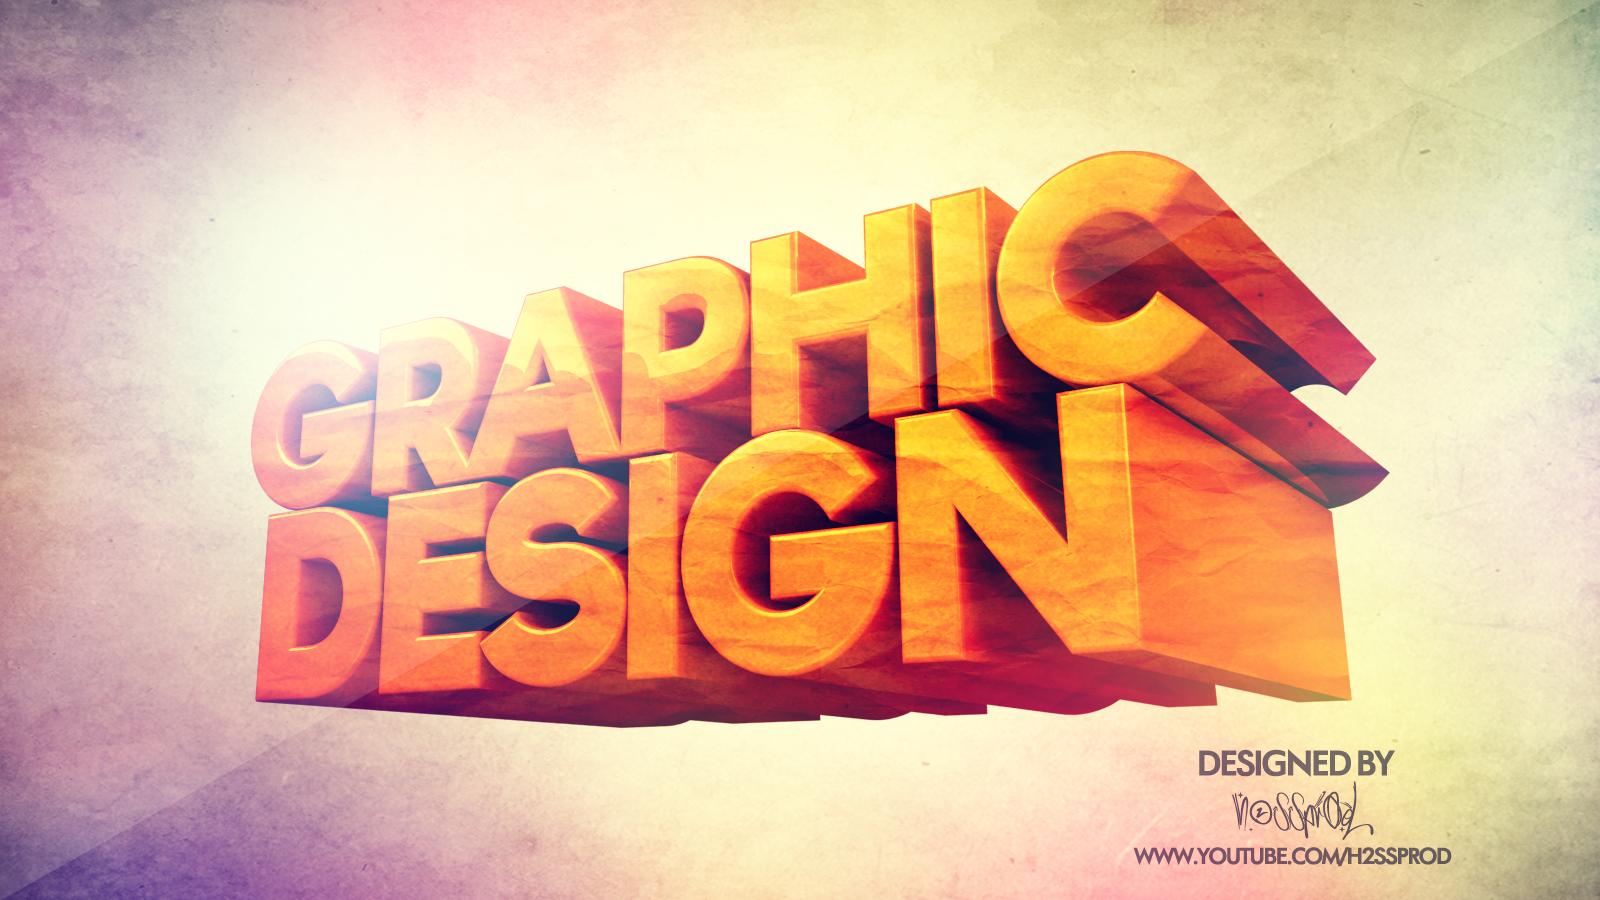 design 3d. . software company elecosoft announces that its